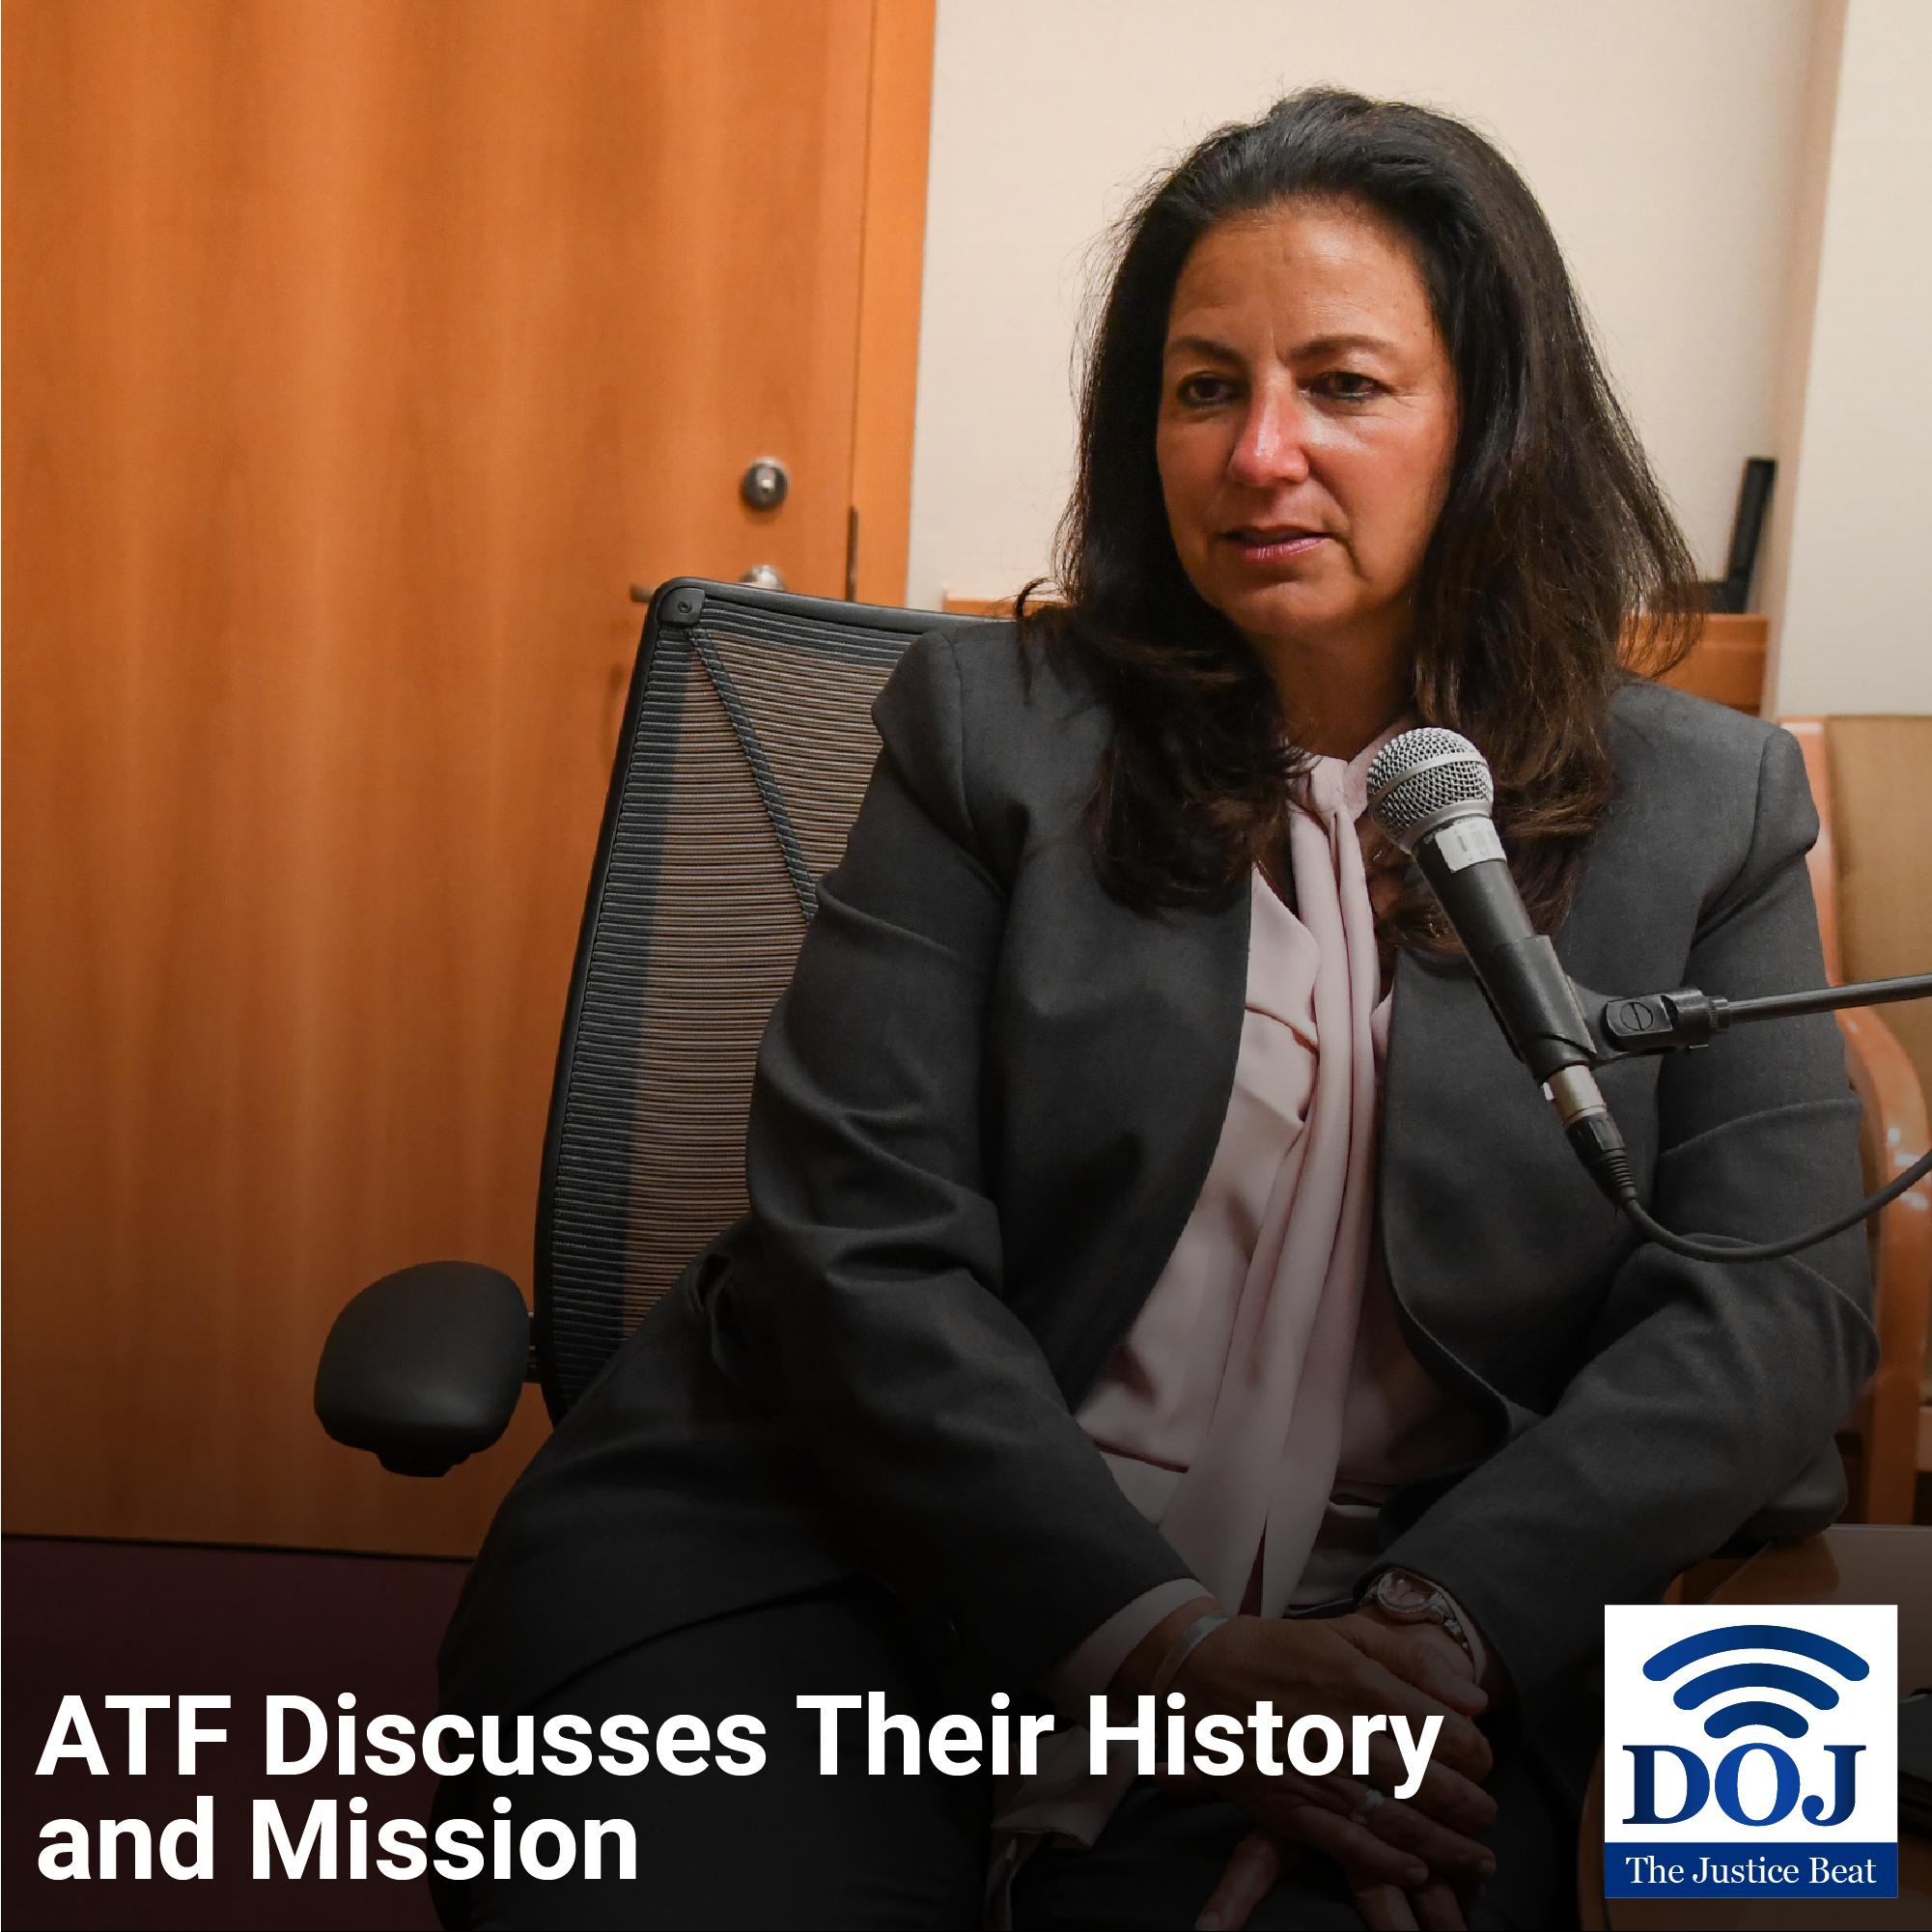 Acting Director for ATF Regina Lombardo